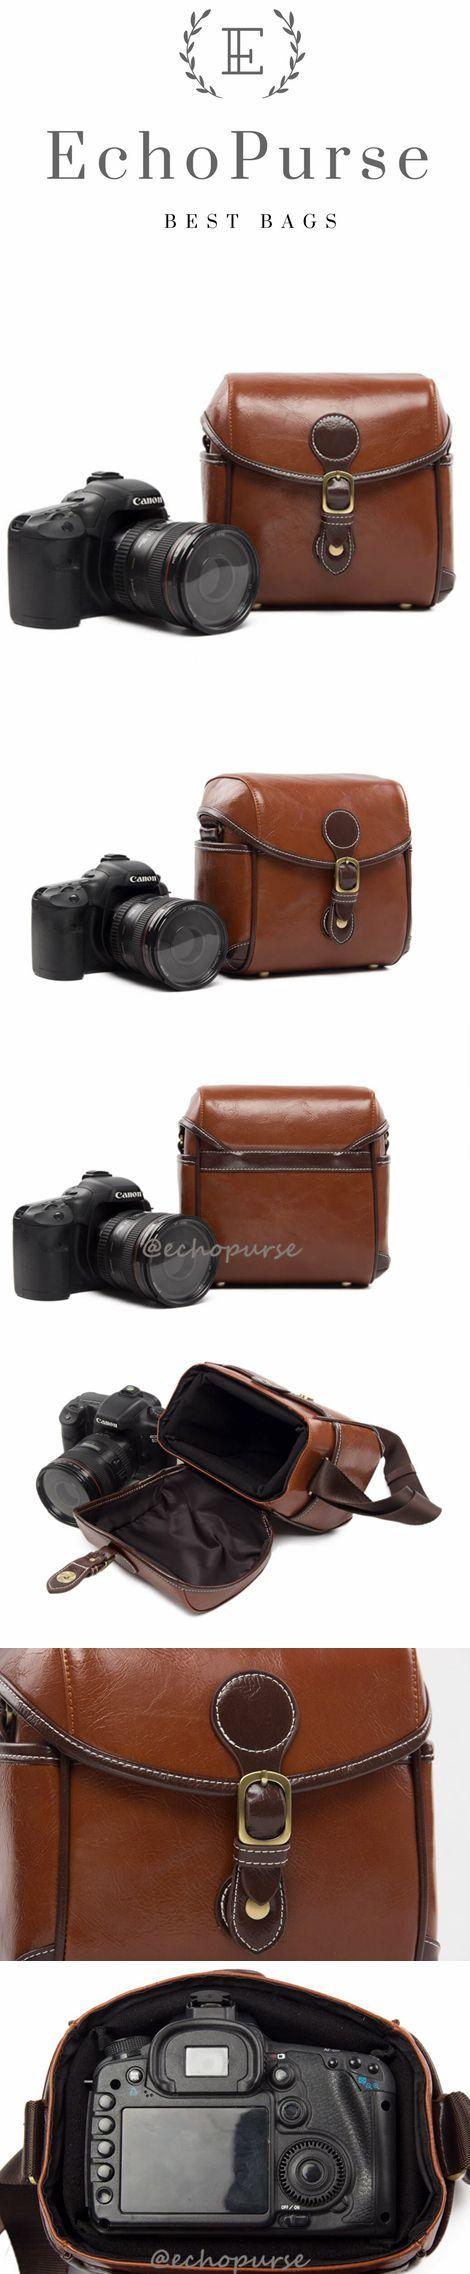 Hot Sale PU Leather DSLR Camera Purse, Vintage Brown SLR Camera Case 288